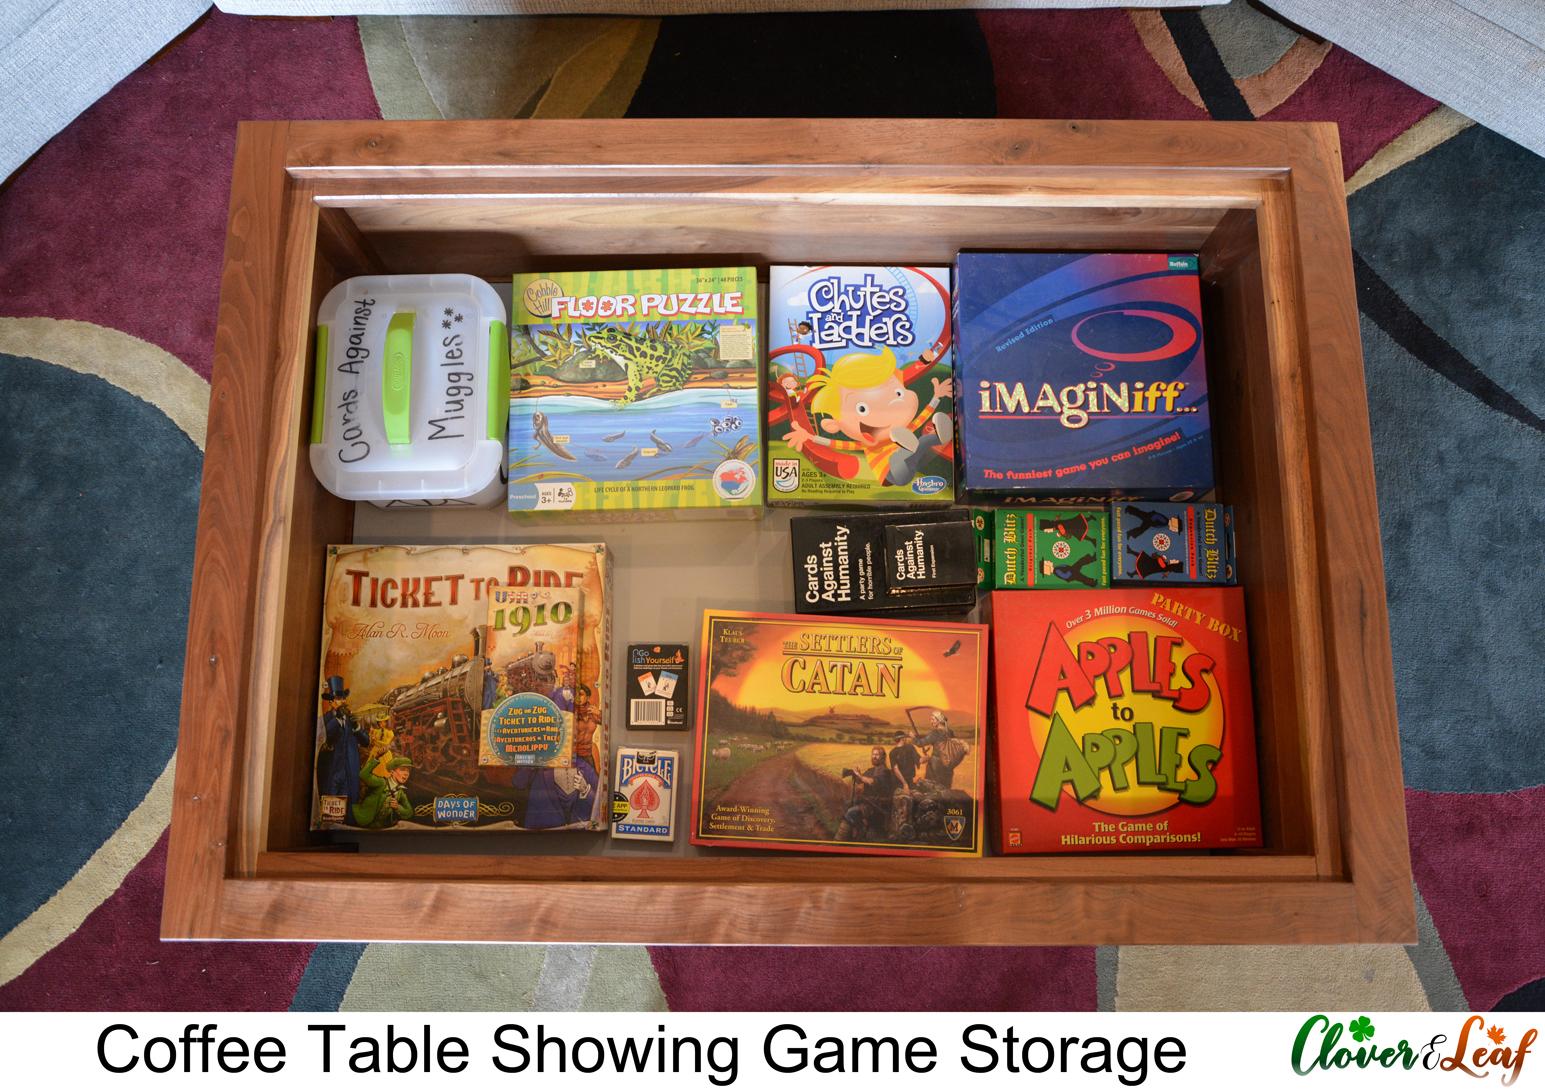 Coffee Table Showing Game Storage.jpg